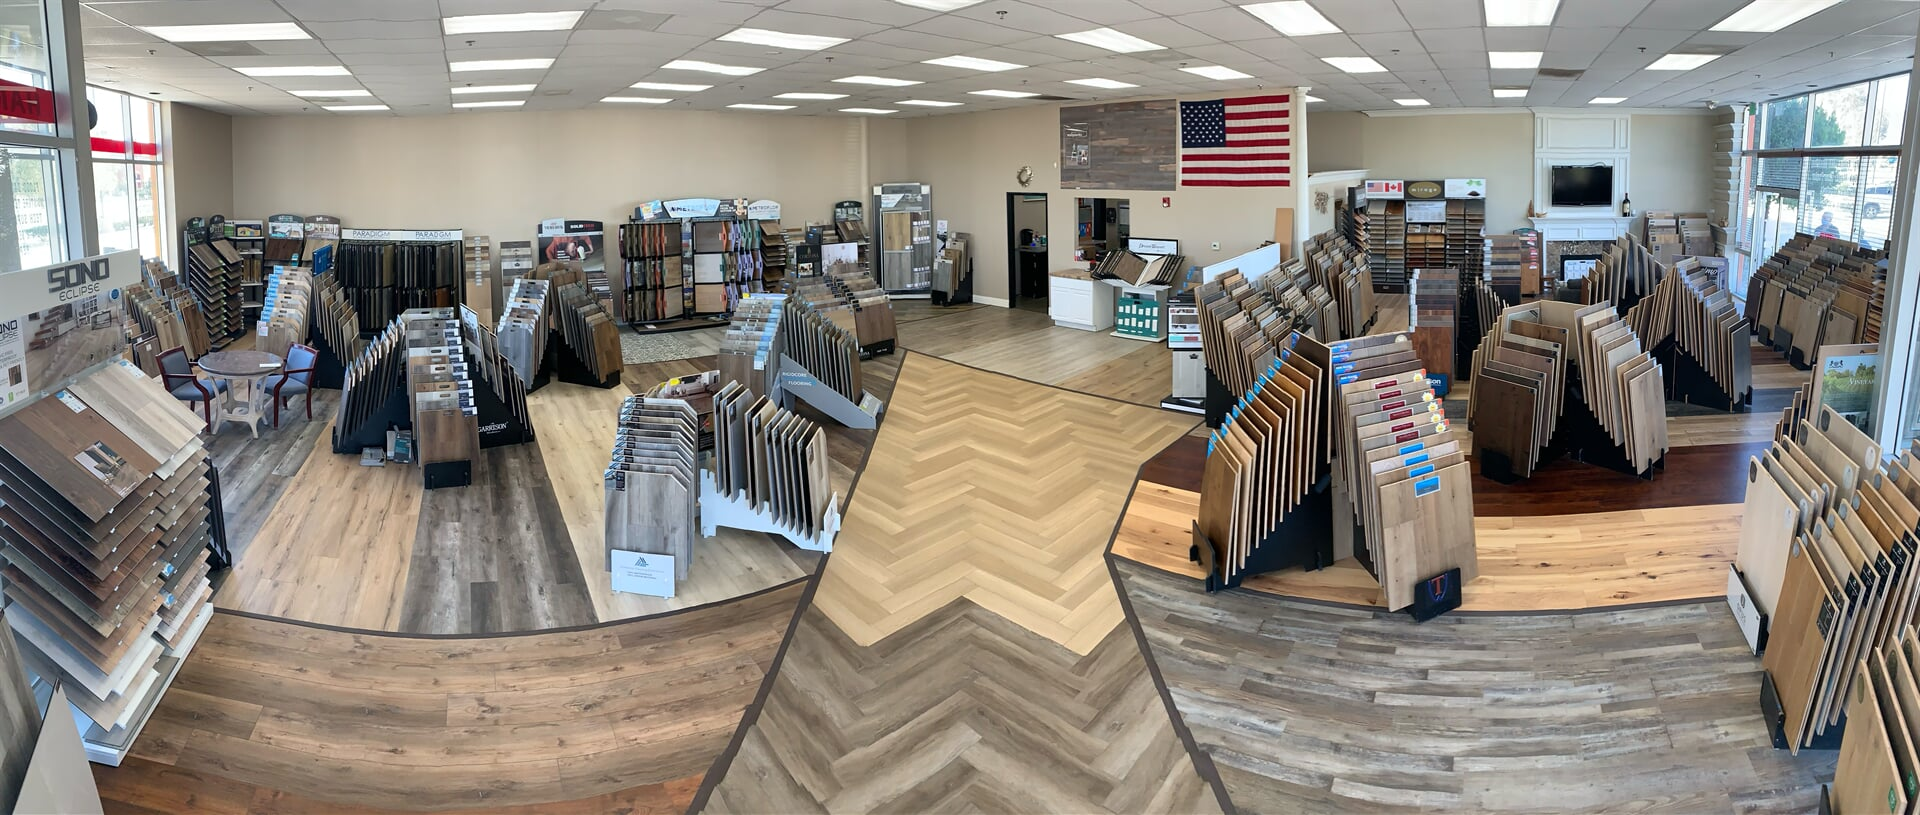 Hardwood Floors Outlet showroom near Murrieta, CA